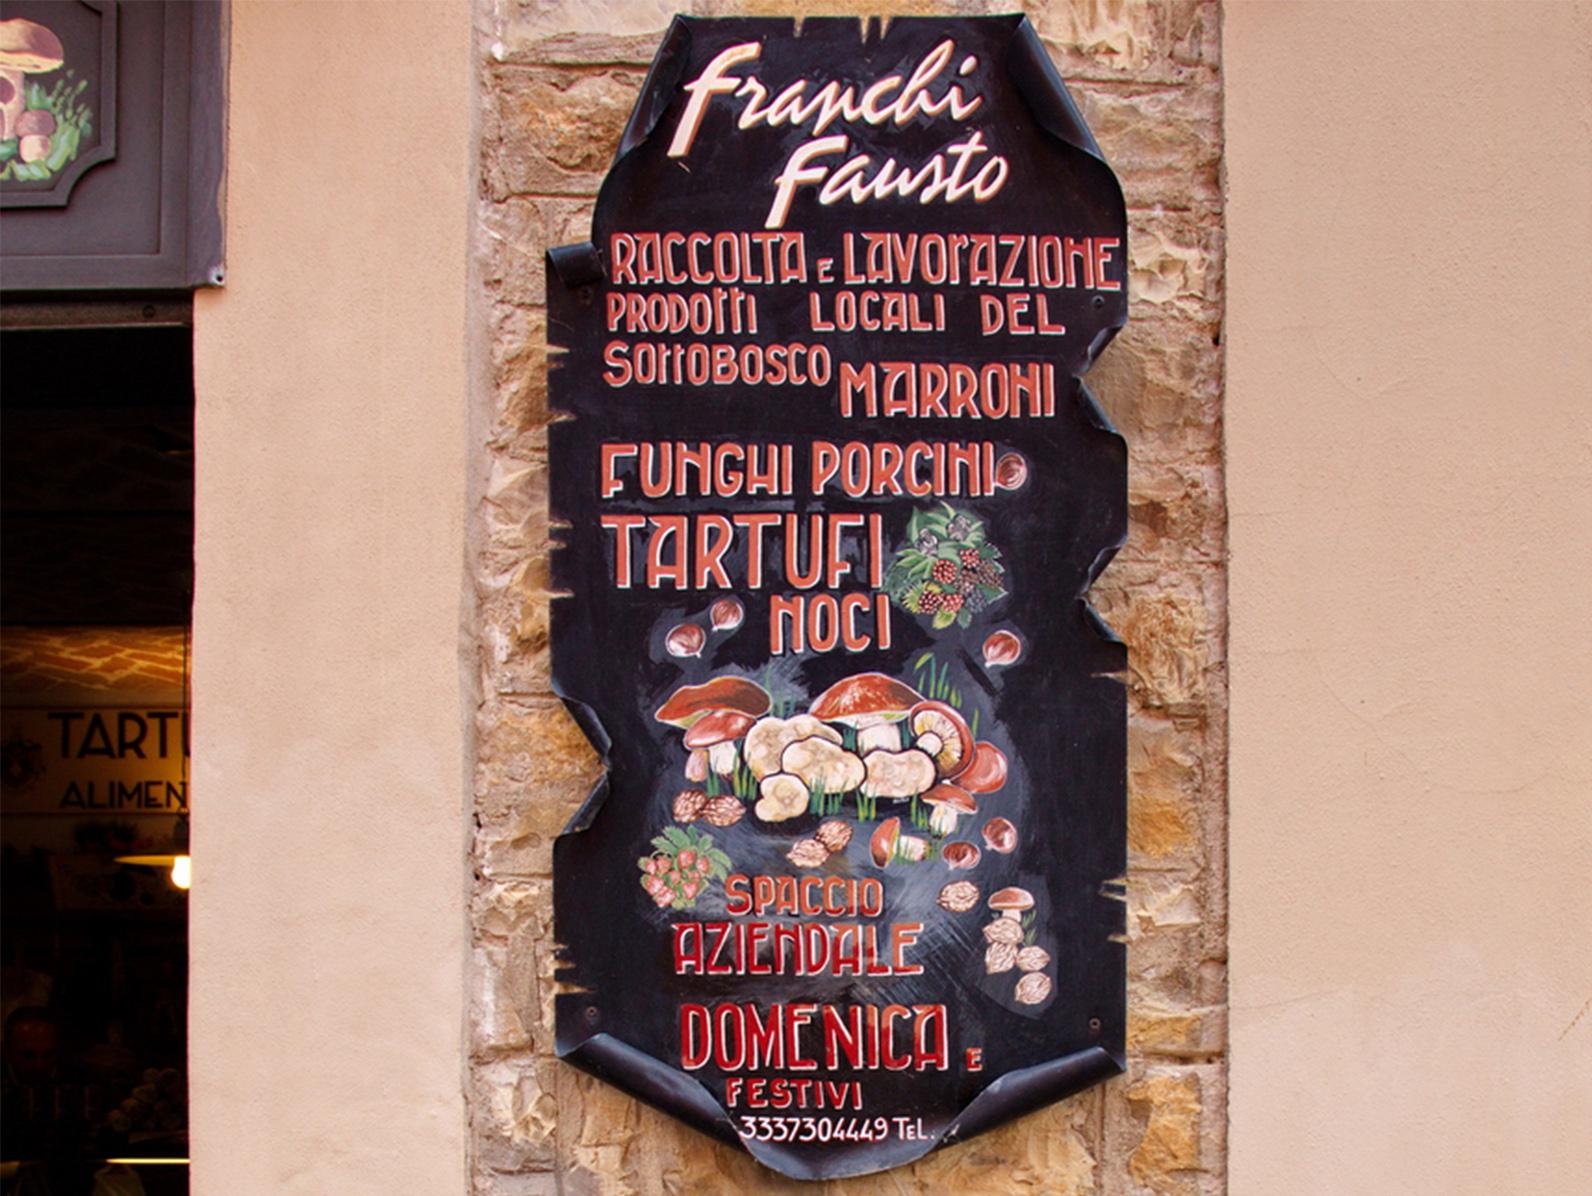 SAVIGNO FUNGHI E TARTUFI di Franchi Fausto